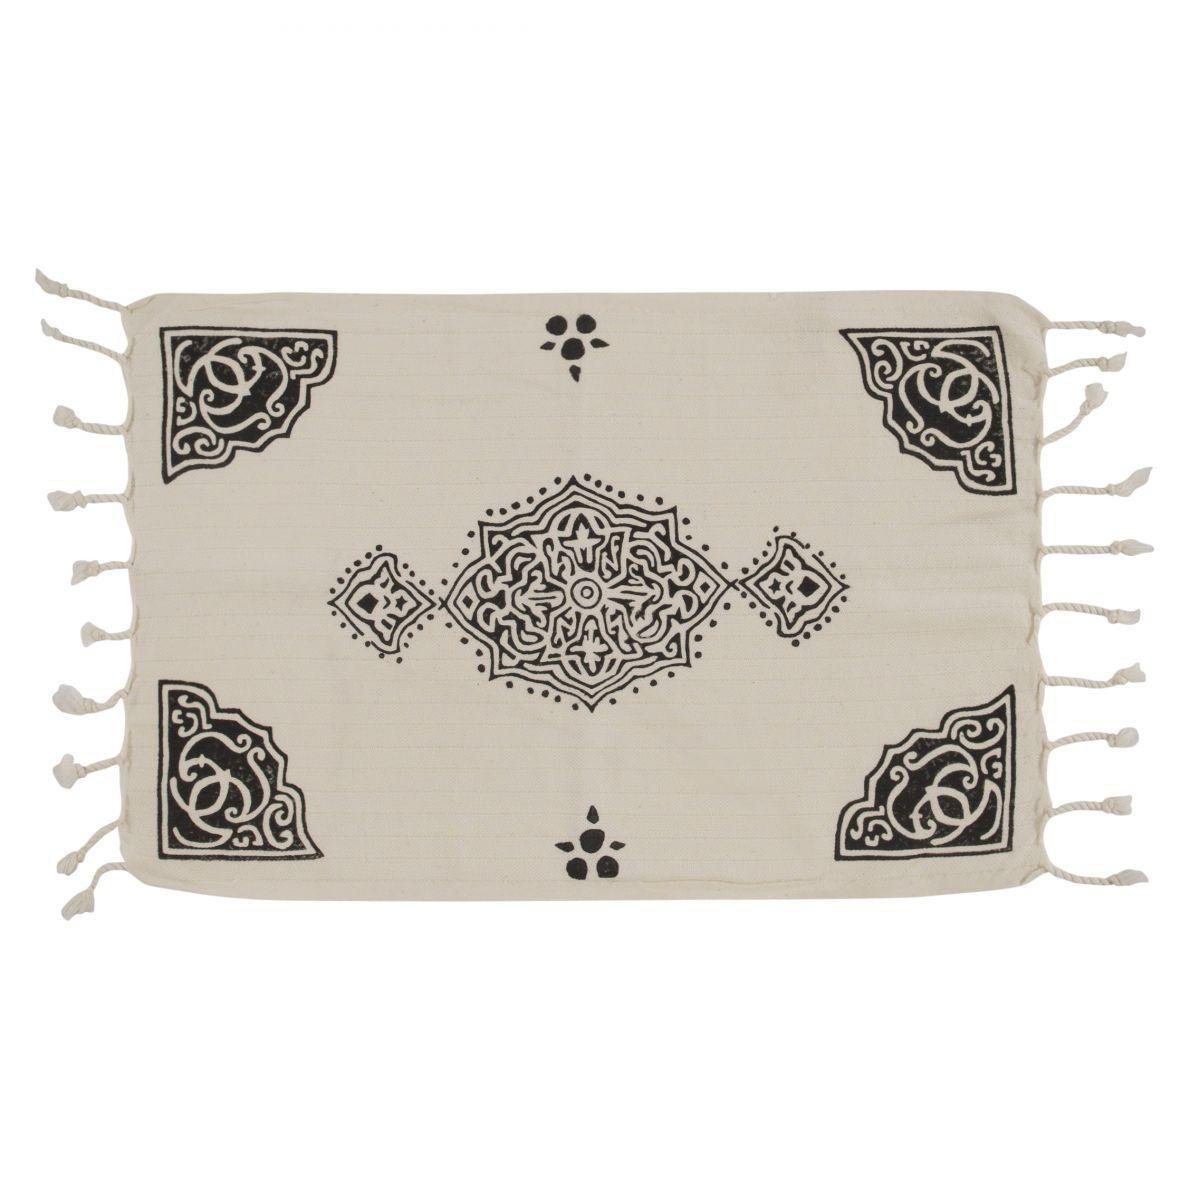 Peshkir Mini Towel - Hand Printed 02 / Black (30x50)